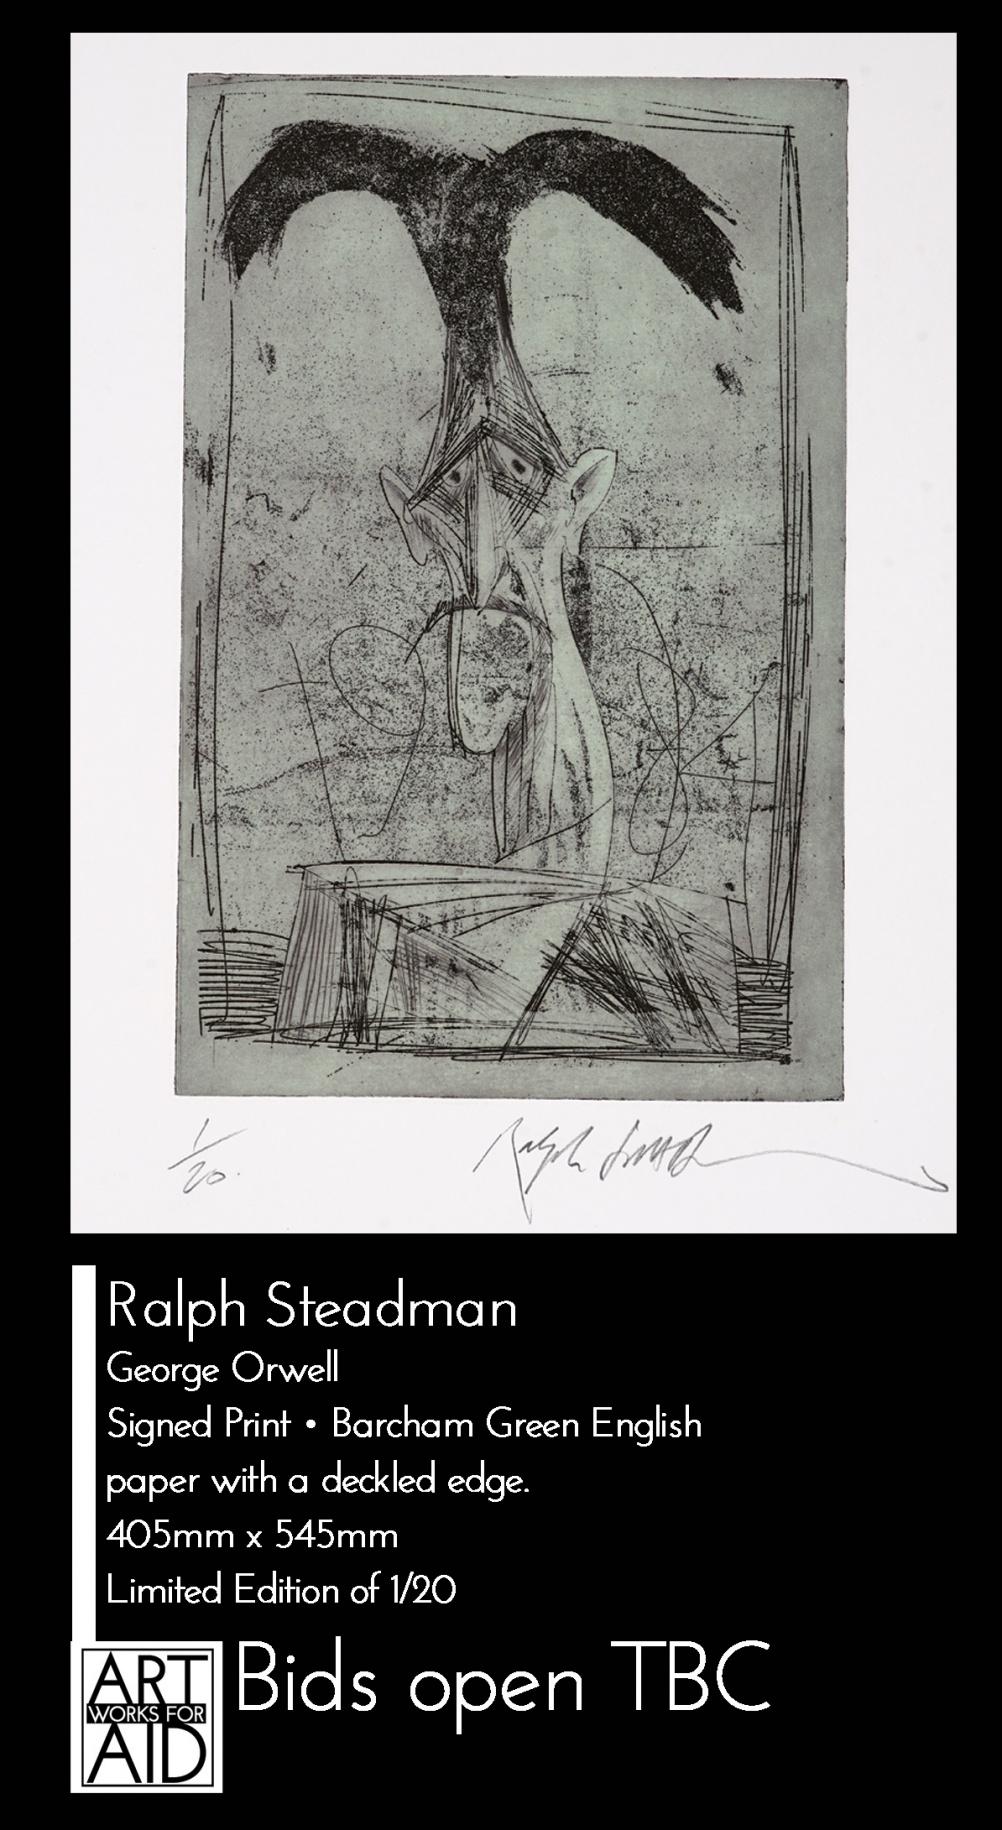 © Ralph Steadman - George Orwell